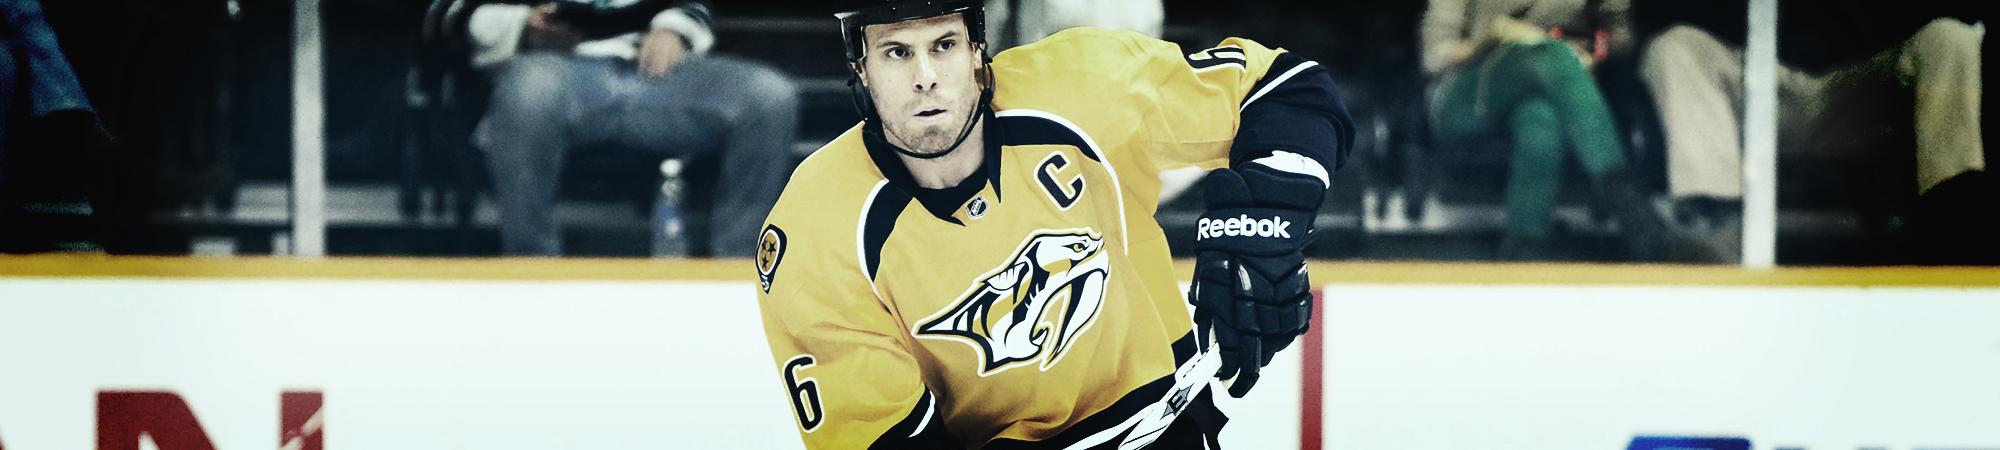 DEL Spieler Edmonton Oilers Fanartikel Eishockey Eishockey Pin NHL